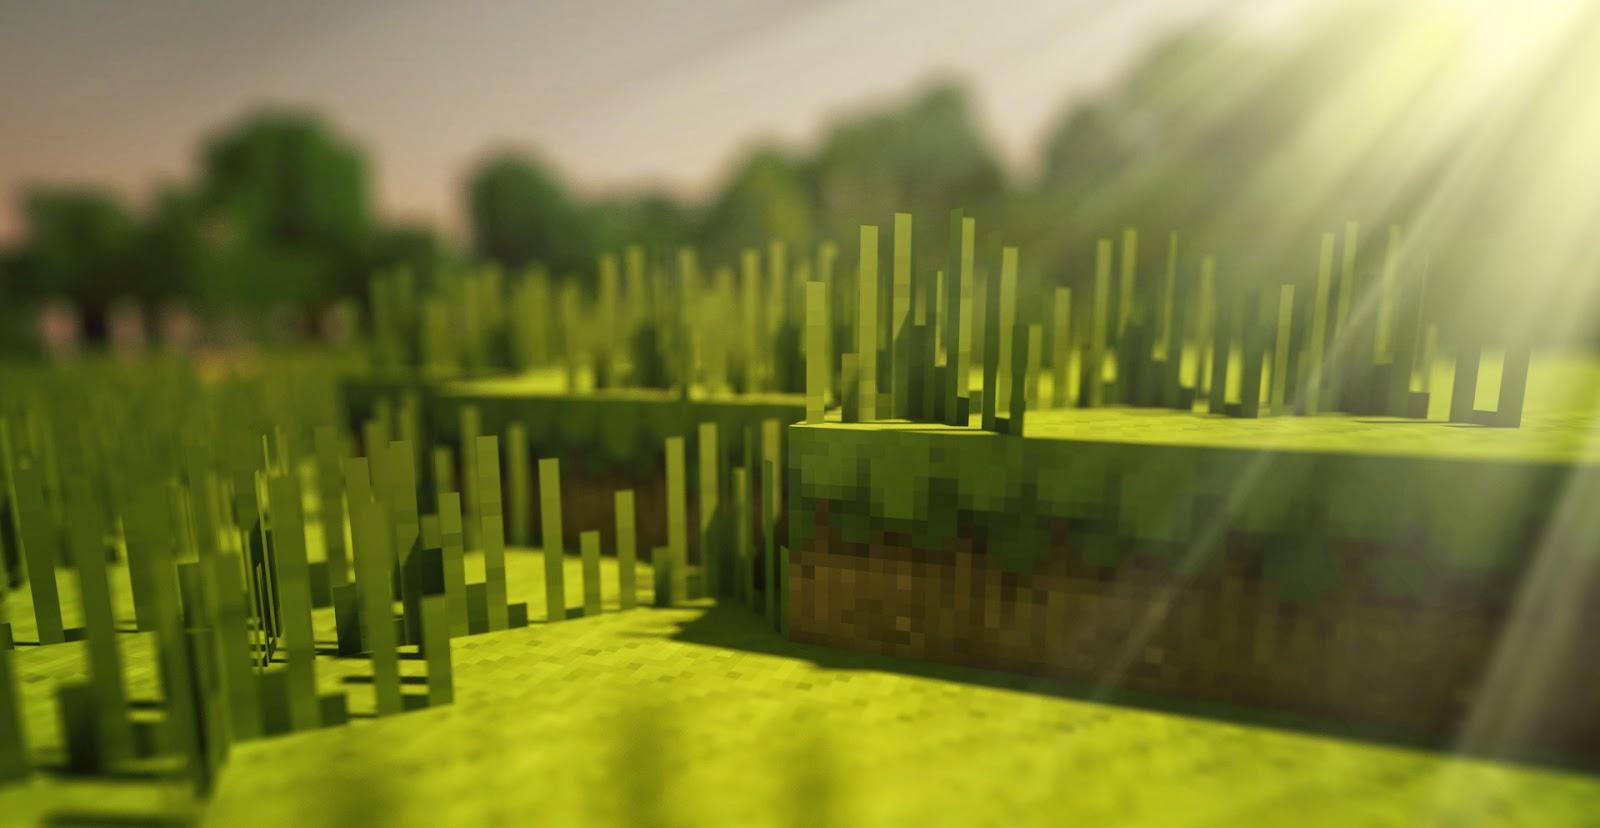 20 Adet Destansı Minecraft Duvar Kağıdı